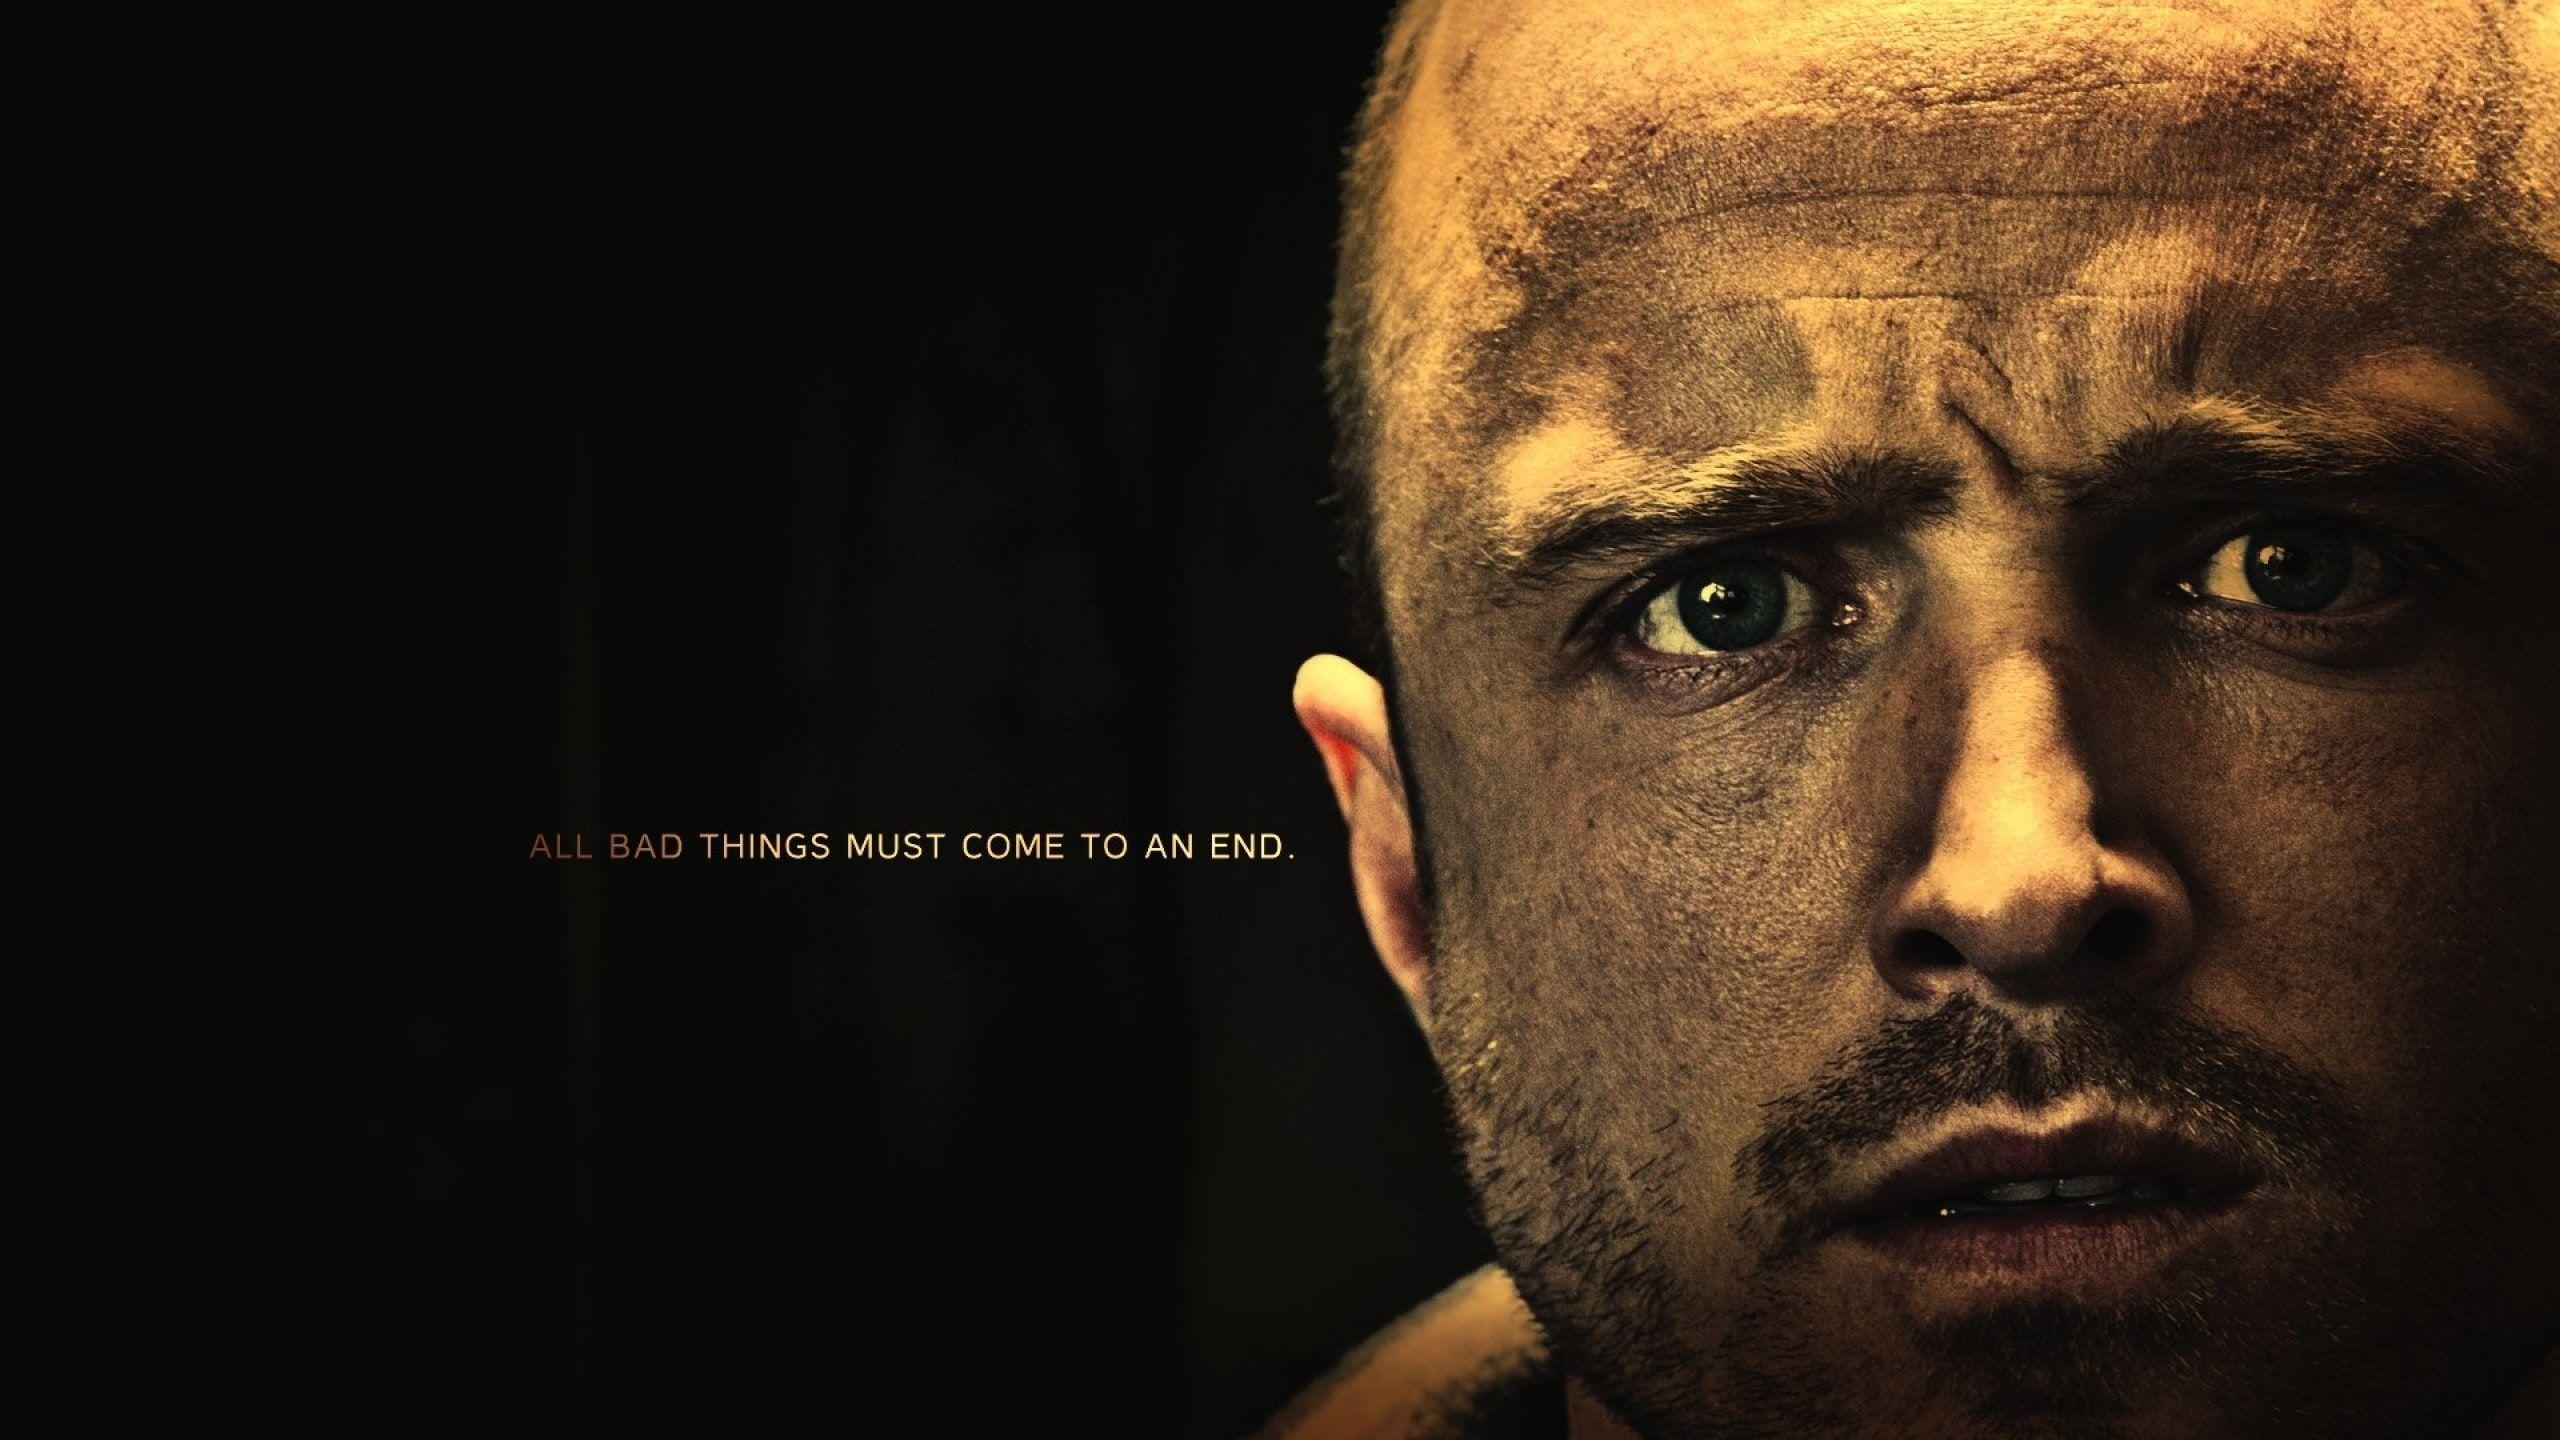 El Camino Breaking Bad Movie Wallpaper Jesse Pinkman Hd 4k 1080p Breaking Bad Breaking Bad Movie Movie Wallpapers